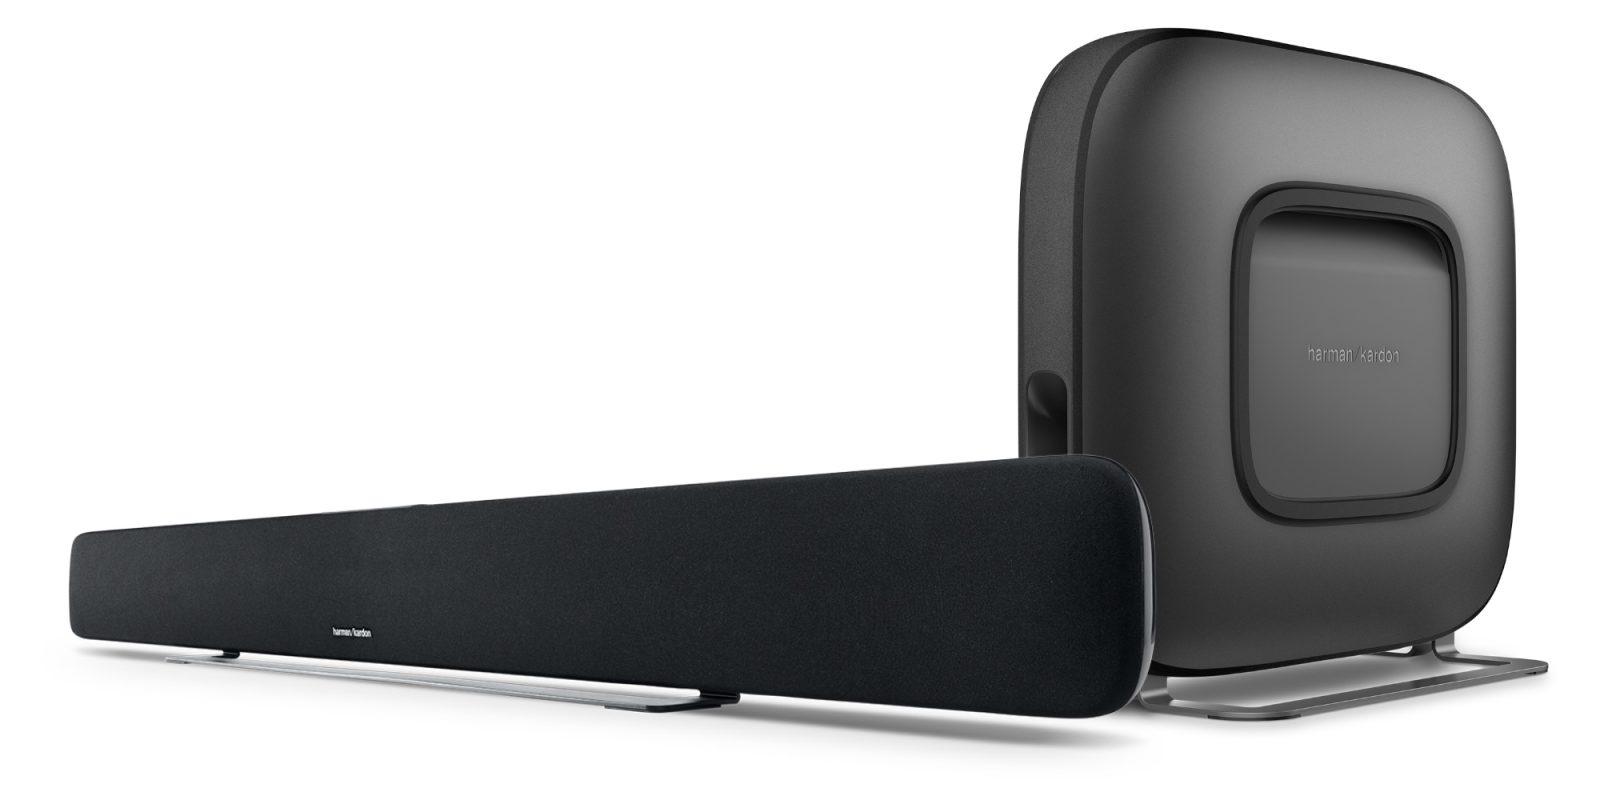 Slash $700 off Harman Kardon's Omni Bar+ Sound System: $200 (All-time low)